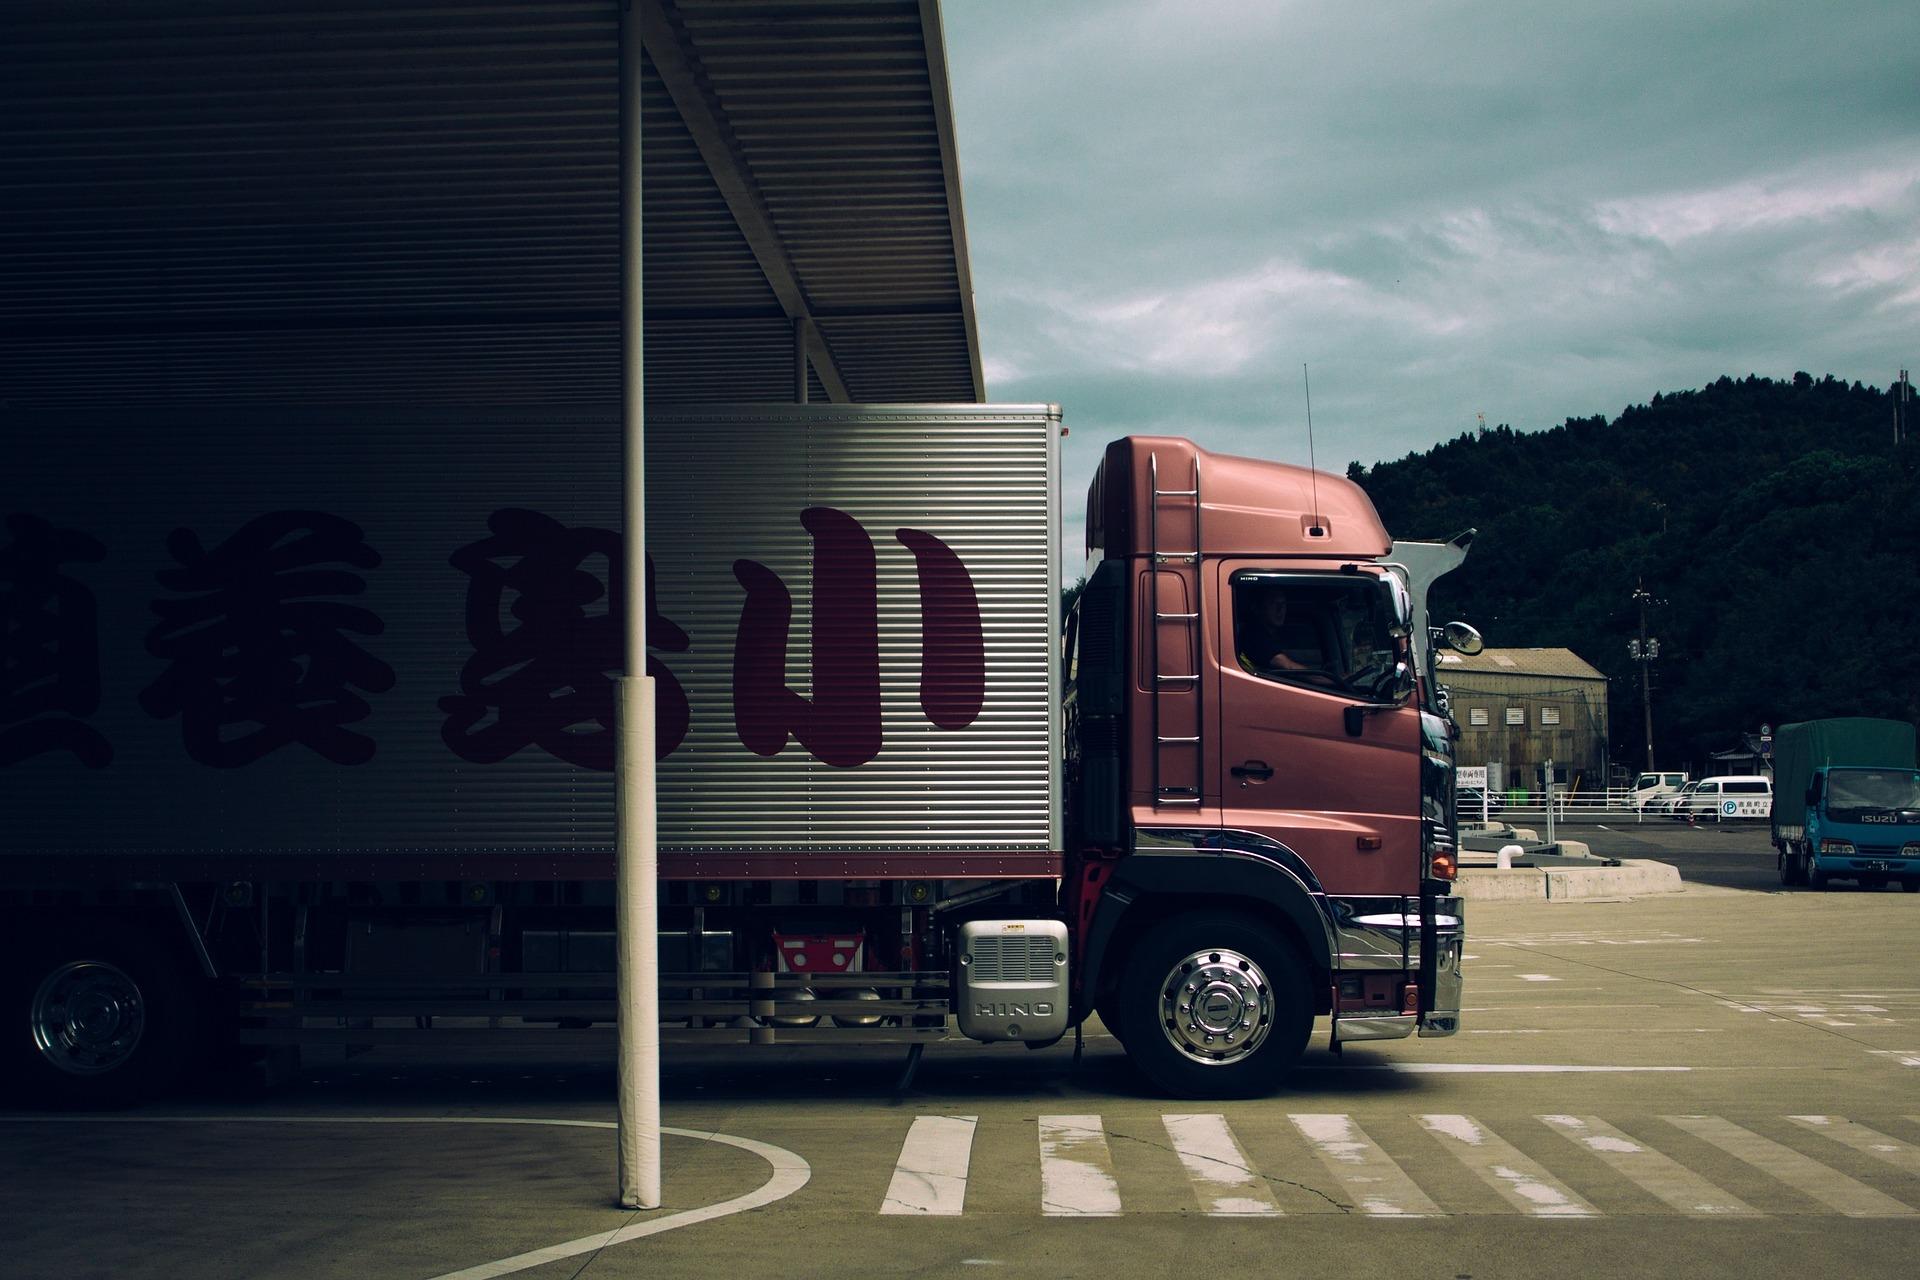 truck-1030846_1920